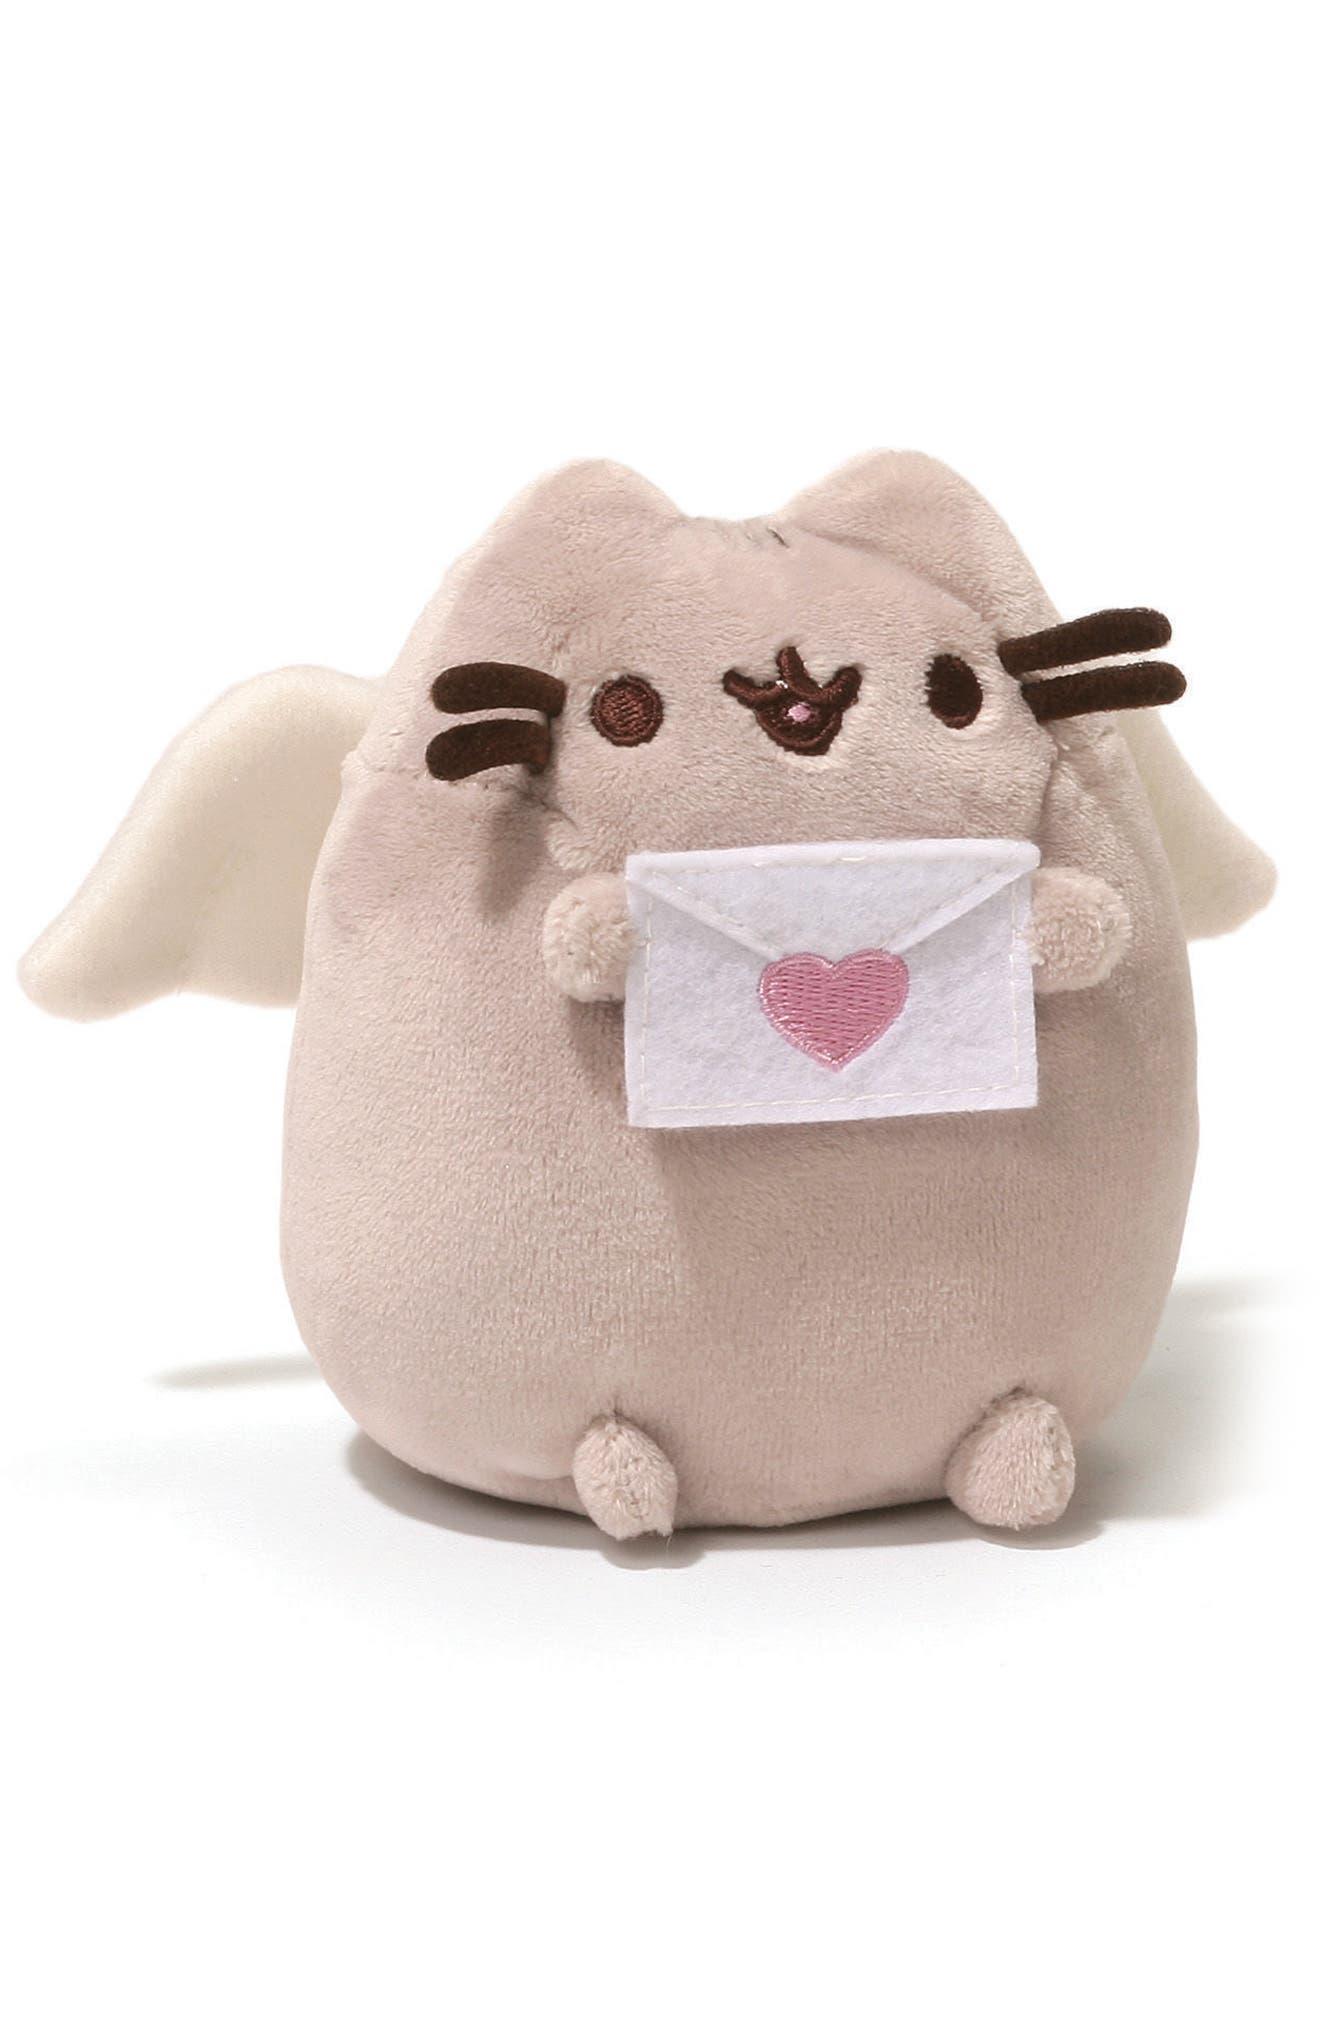 Gund Cupid Pusheen Plush Doll